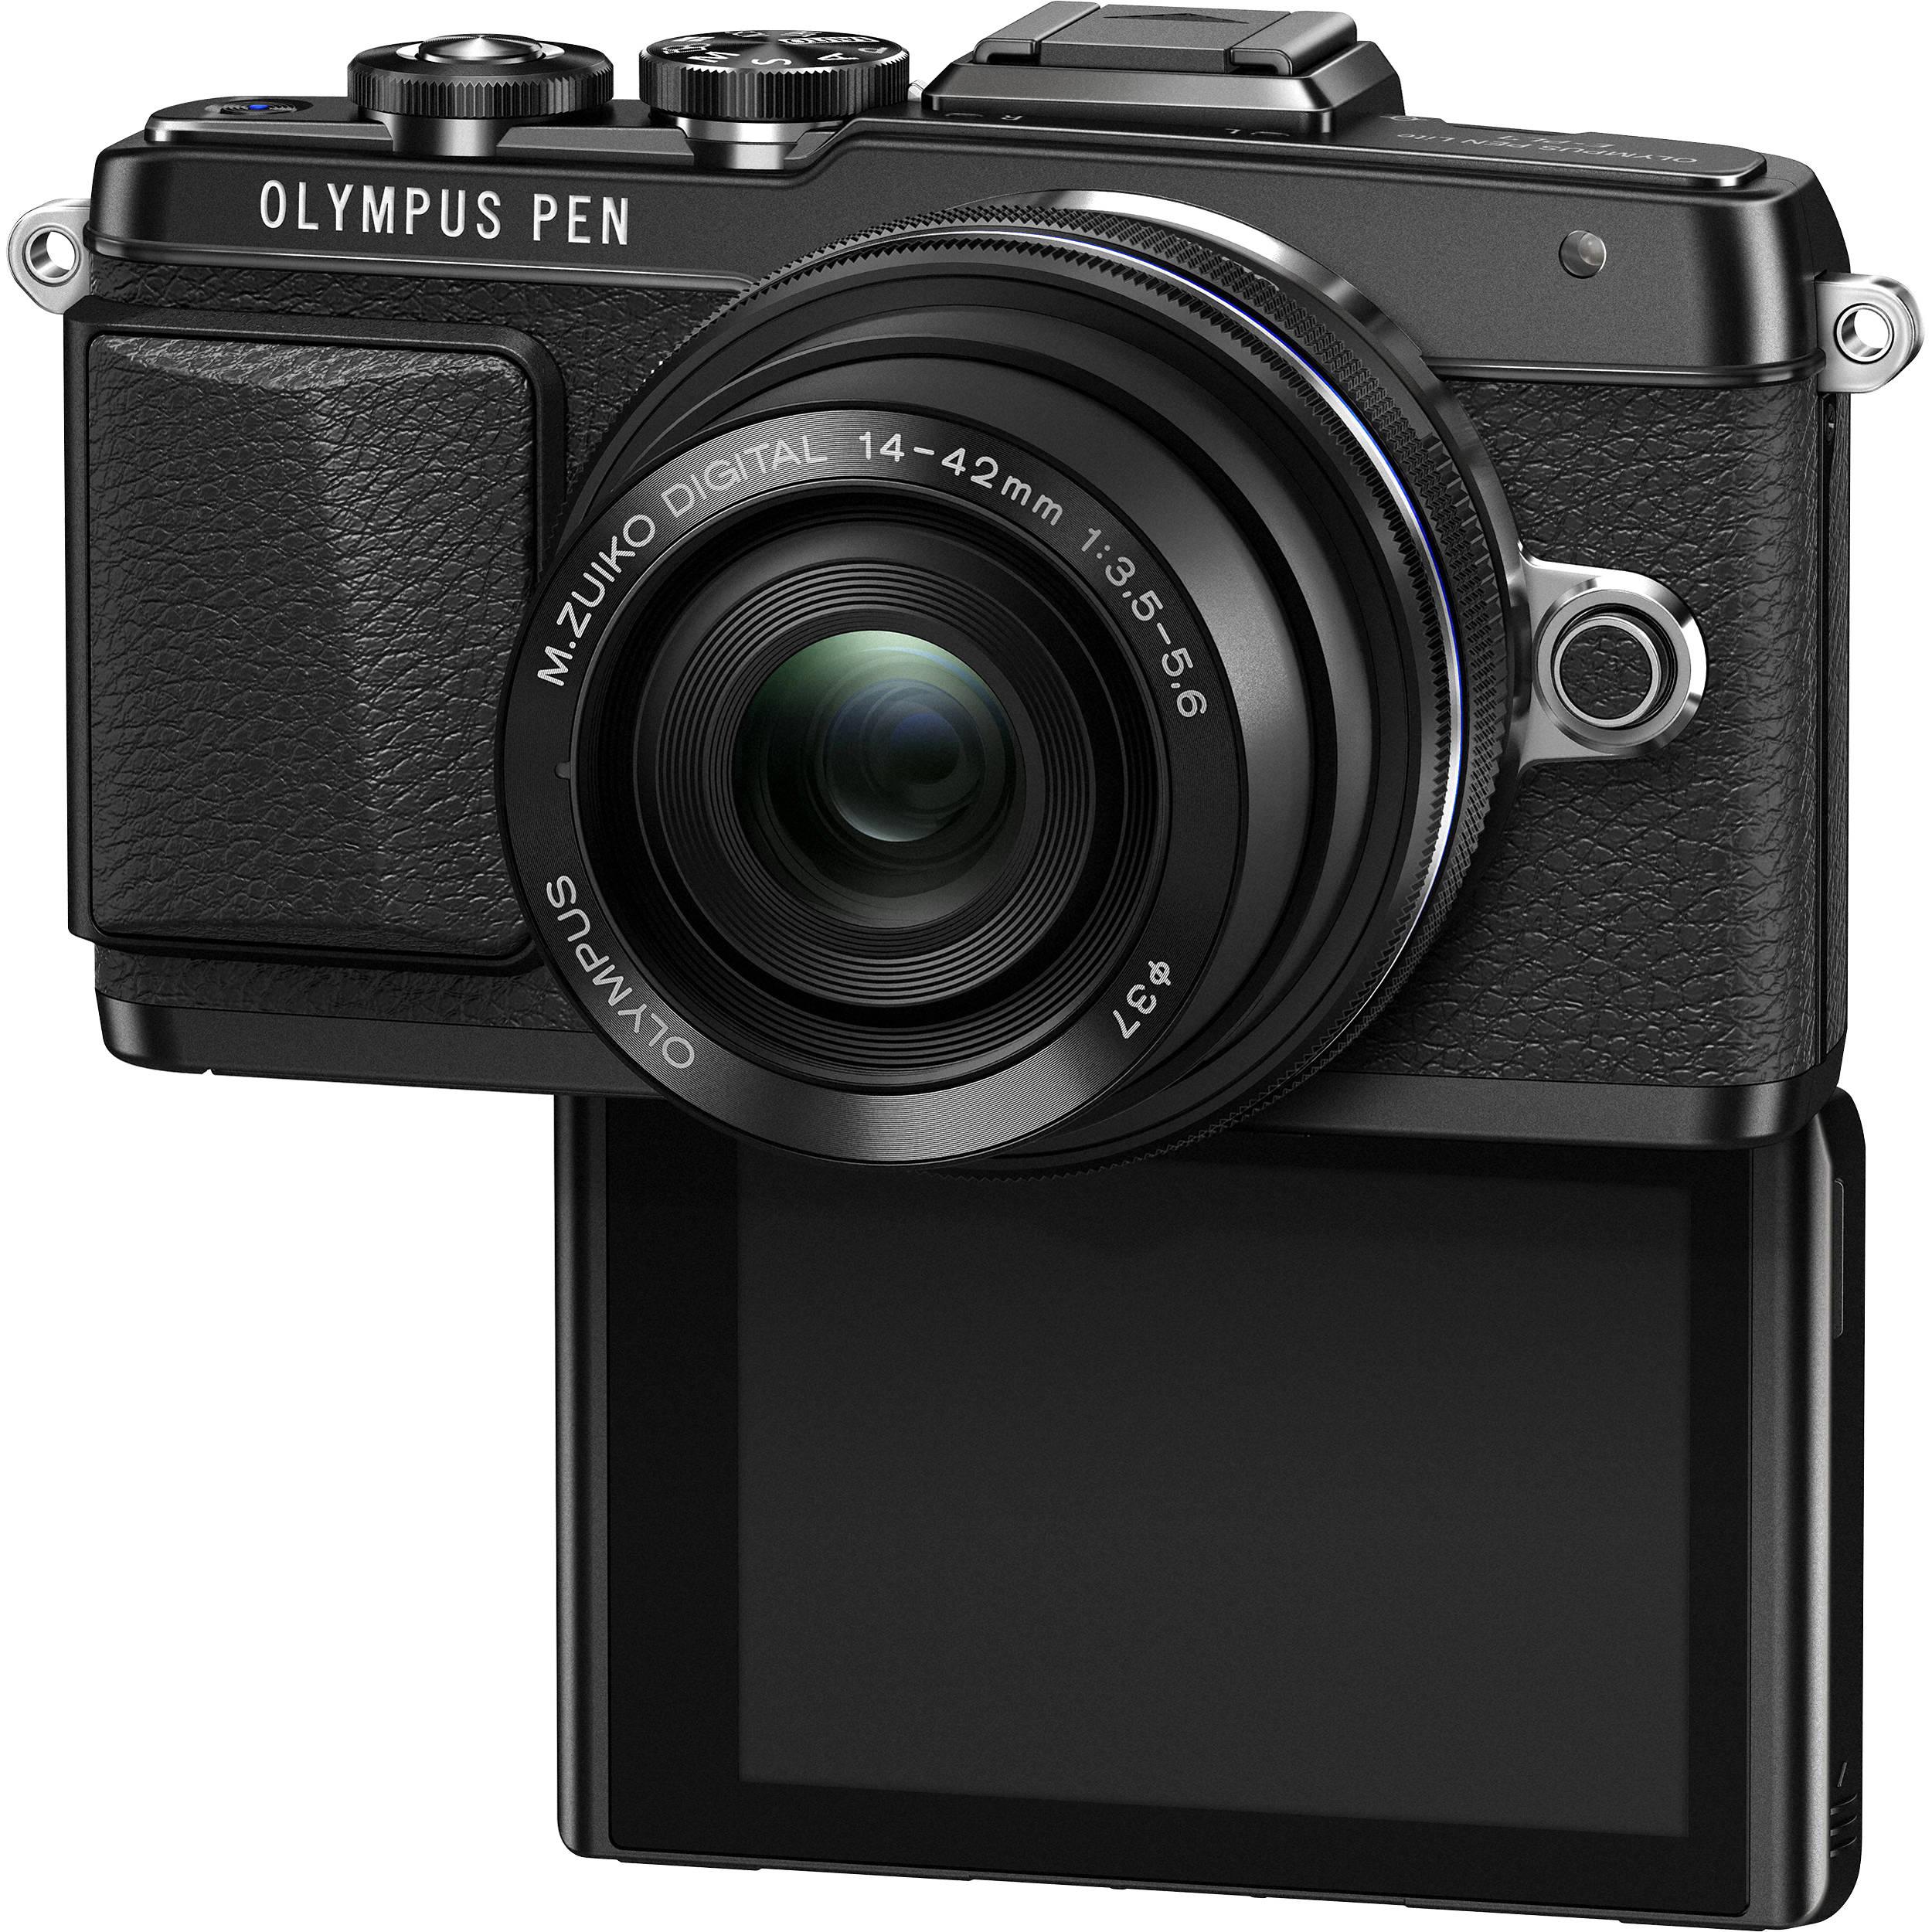 37mm Macro Olympus Pen E-PL7 10x High Definition 2 Element Close-Up Lens